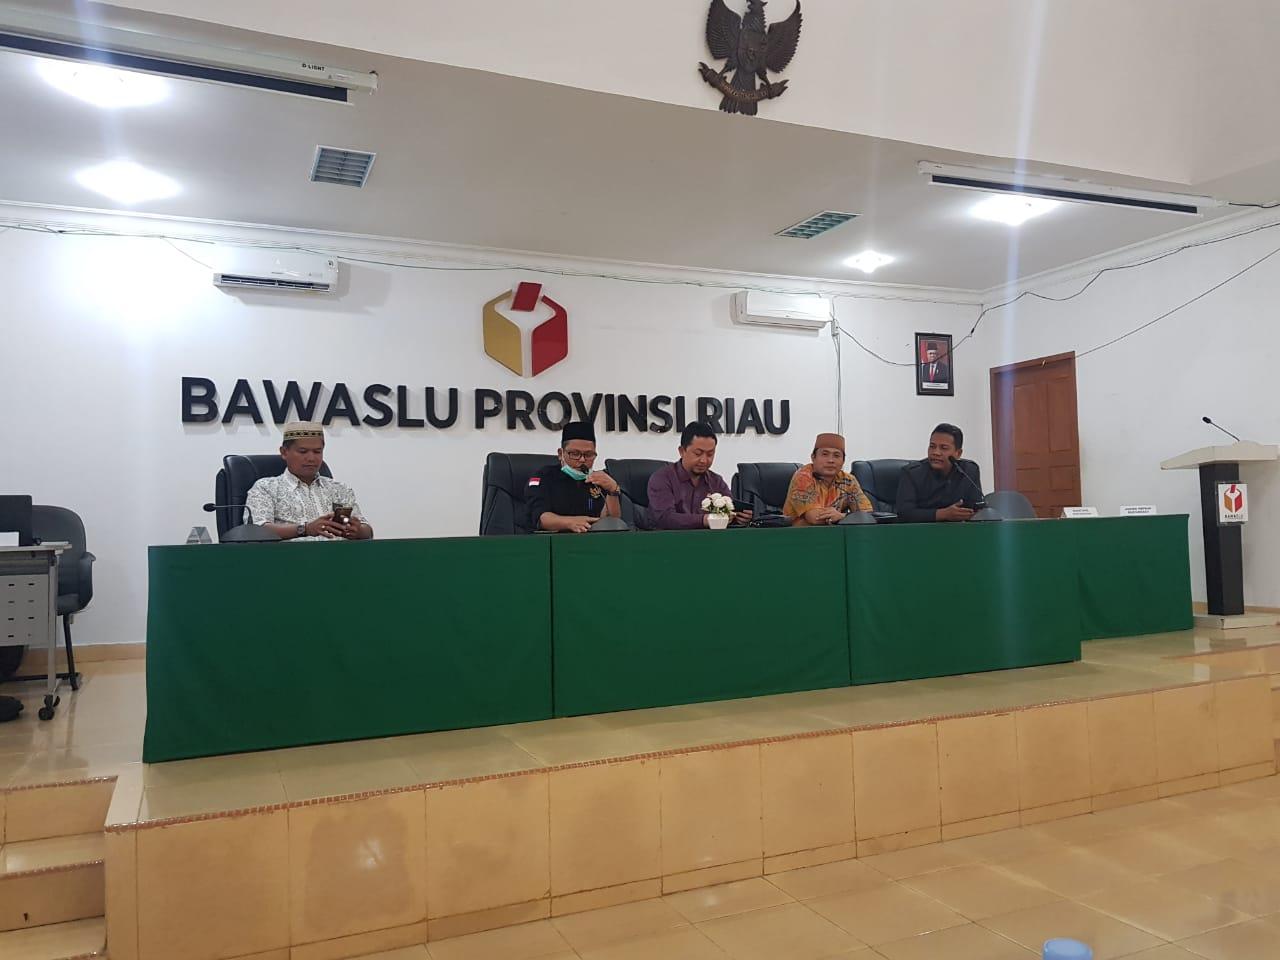 Akses Kantor Belum Diaspal, Ketua Bawaslu Riau Curhat Kepada Anggota DPR RI</a>